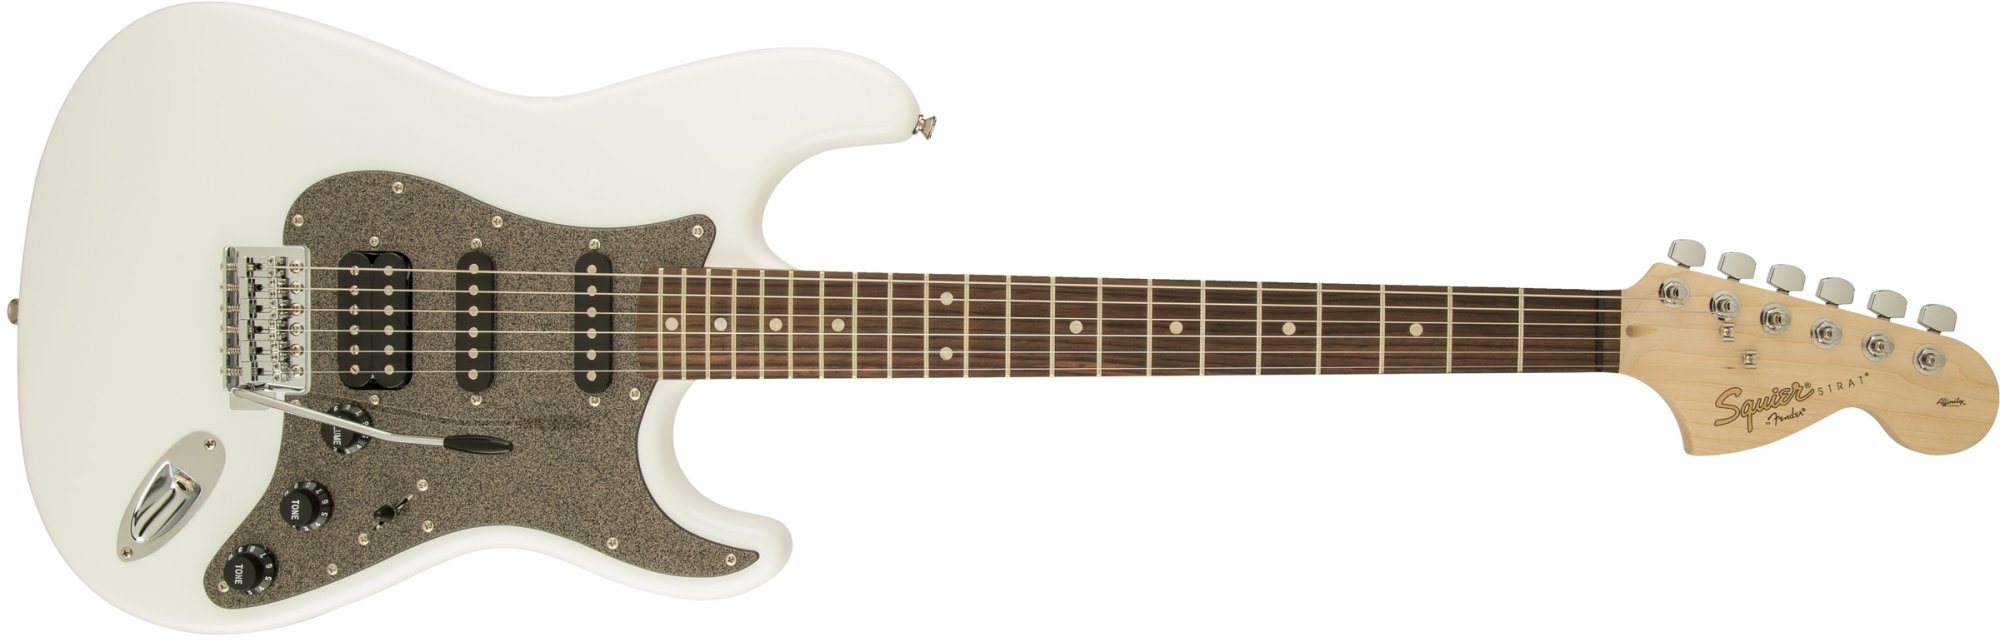 Fender Squier Affinity Stratocaster HSS Black Sparkle Pickguard Olympic White